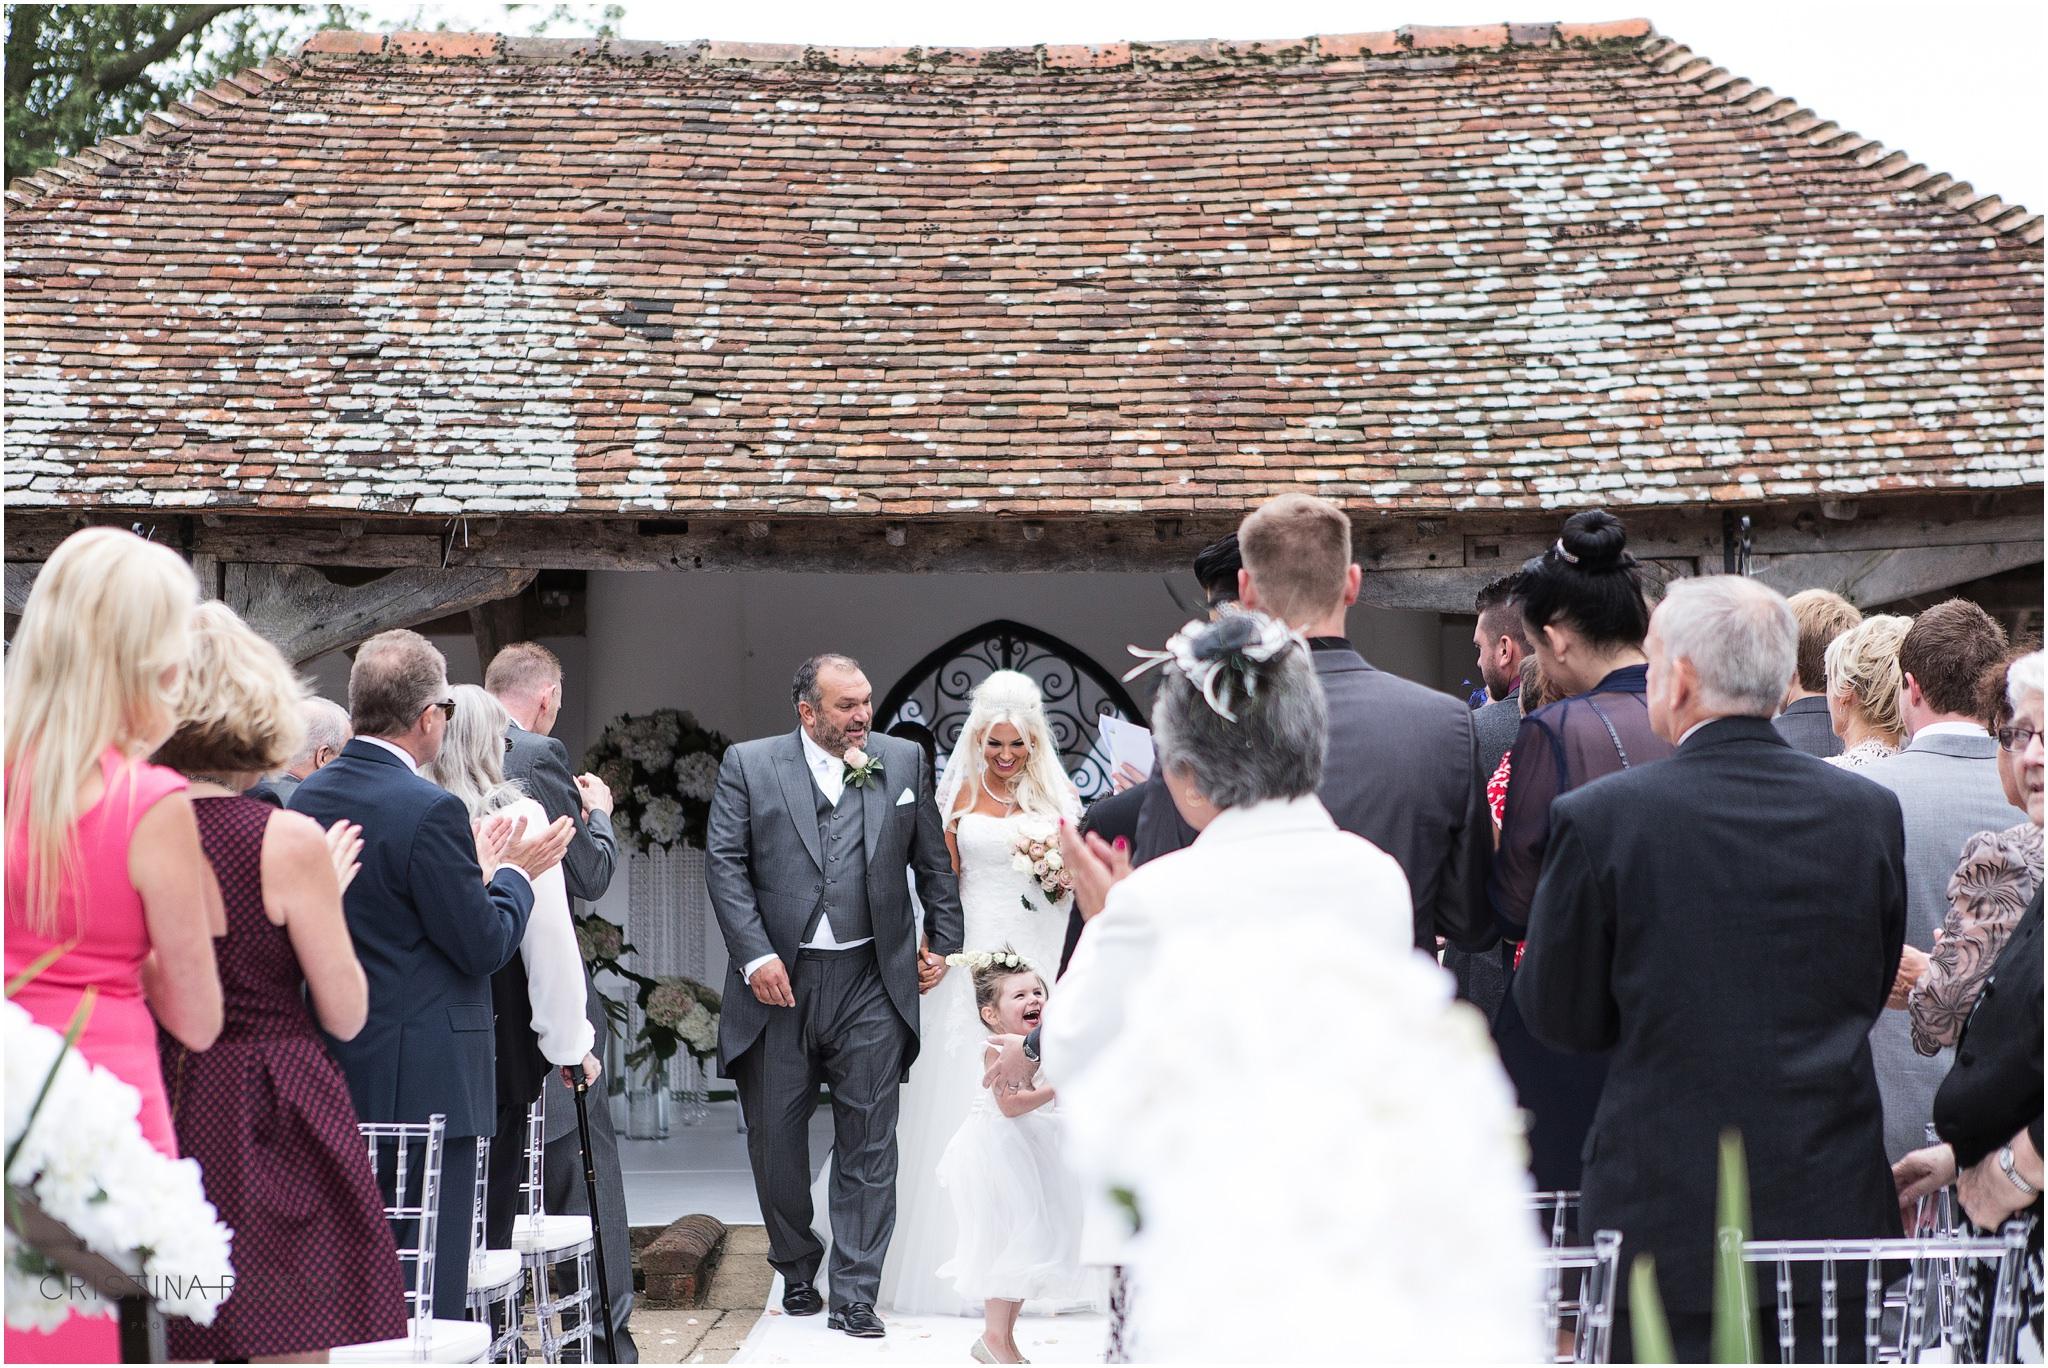 Eastwell Manor Neil Razor Ruddock & Leah Newman wedding_0089